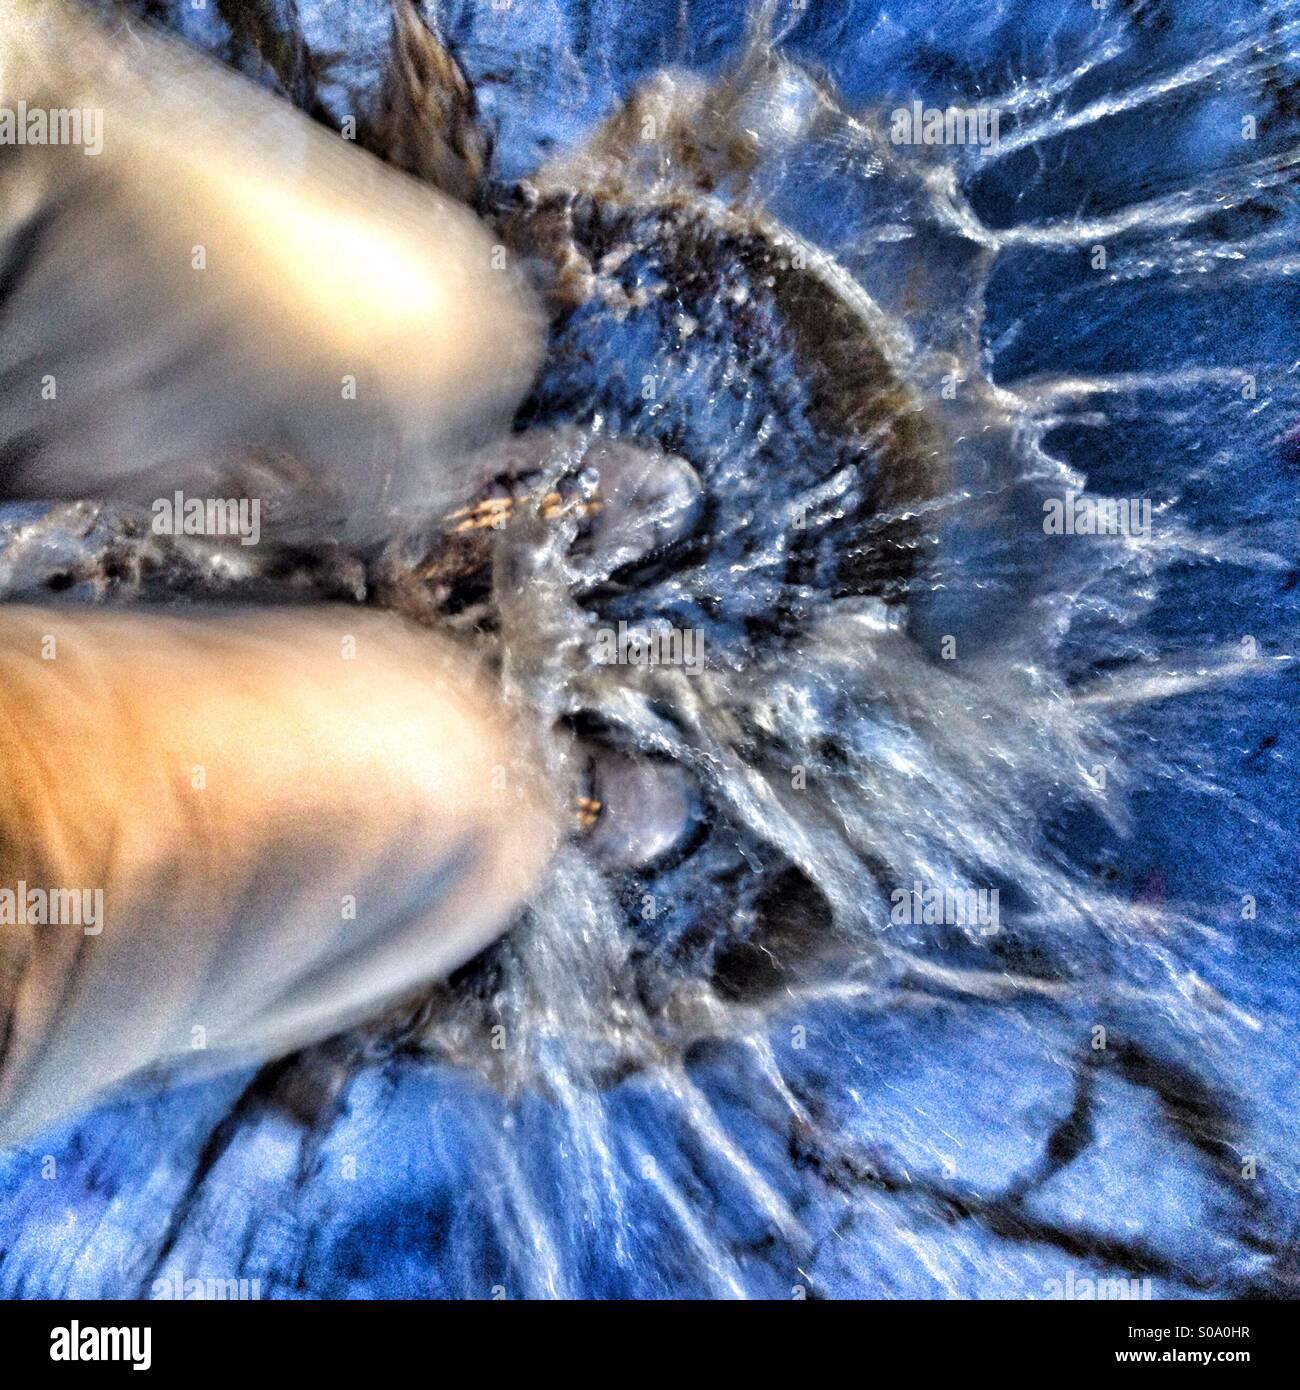 Splashing in puddle - Stock Image